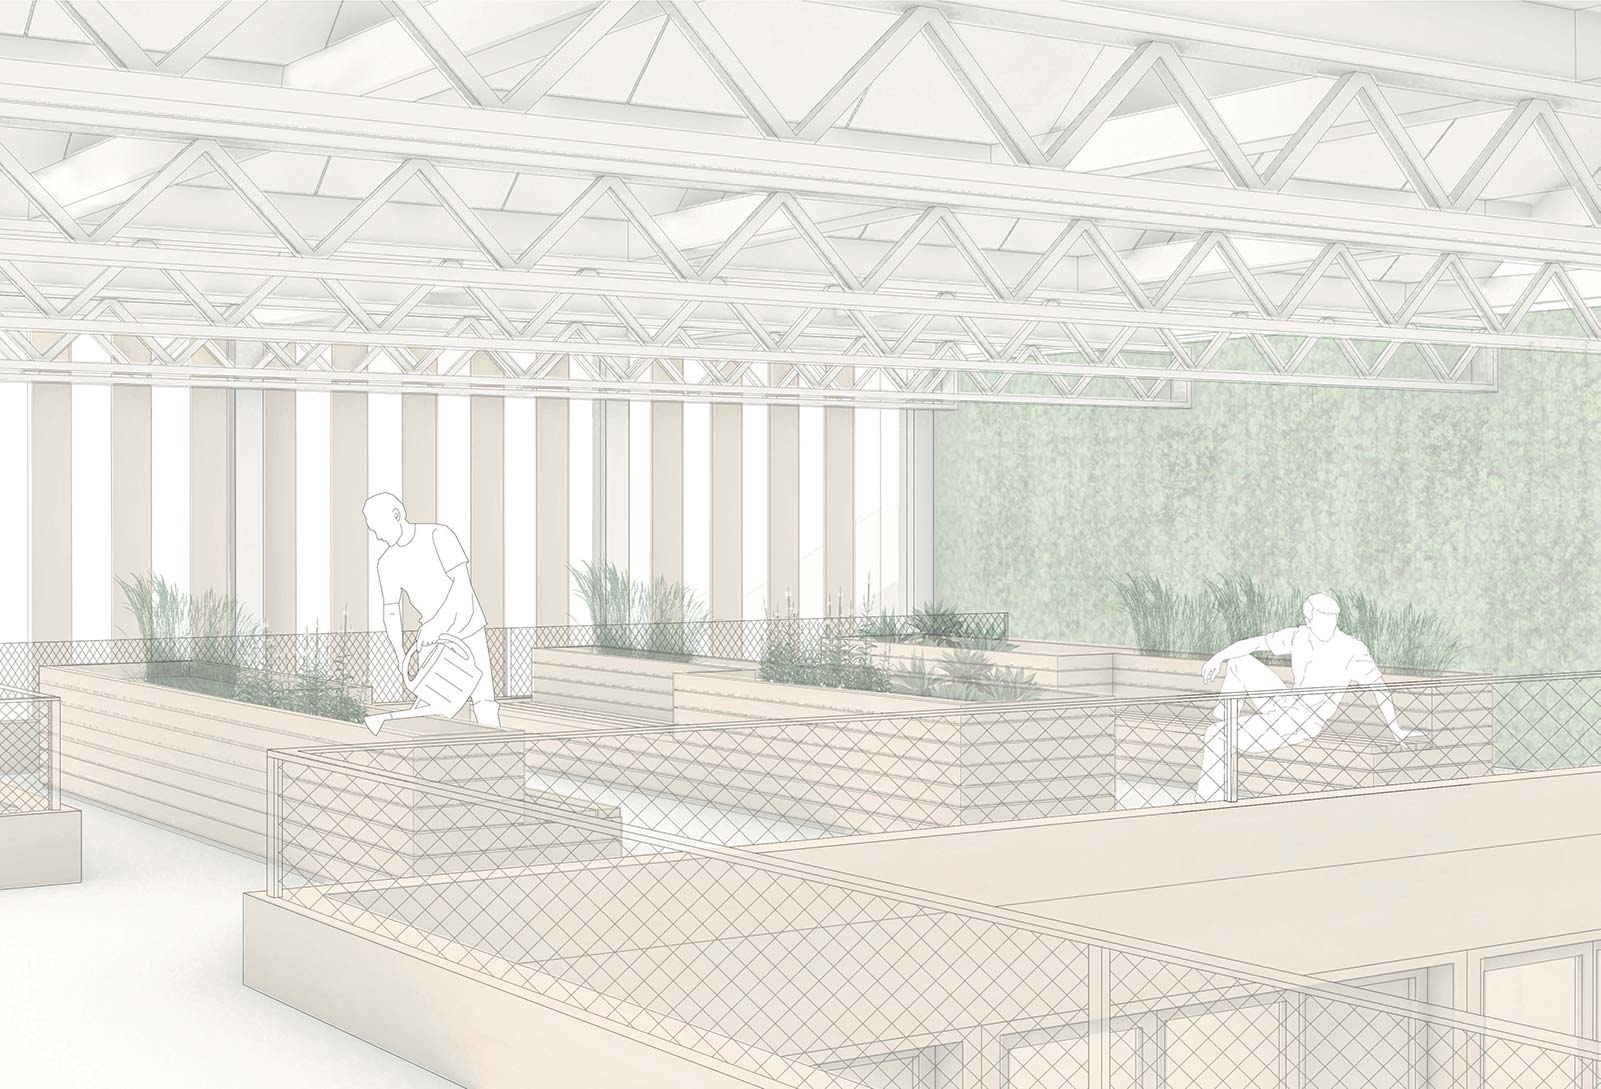 mimo-urban-gardening-terrace